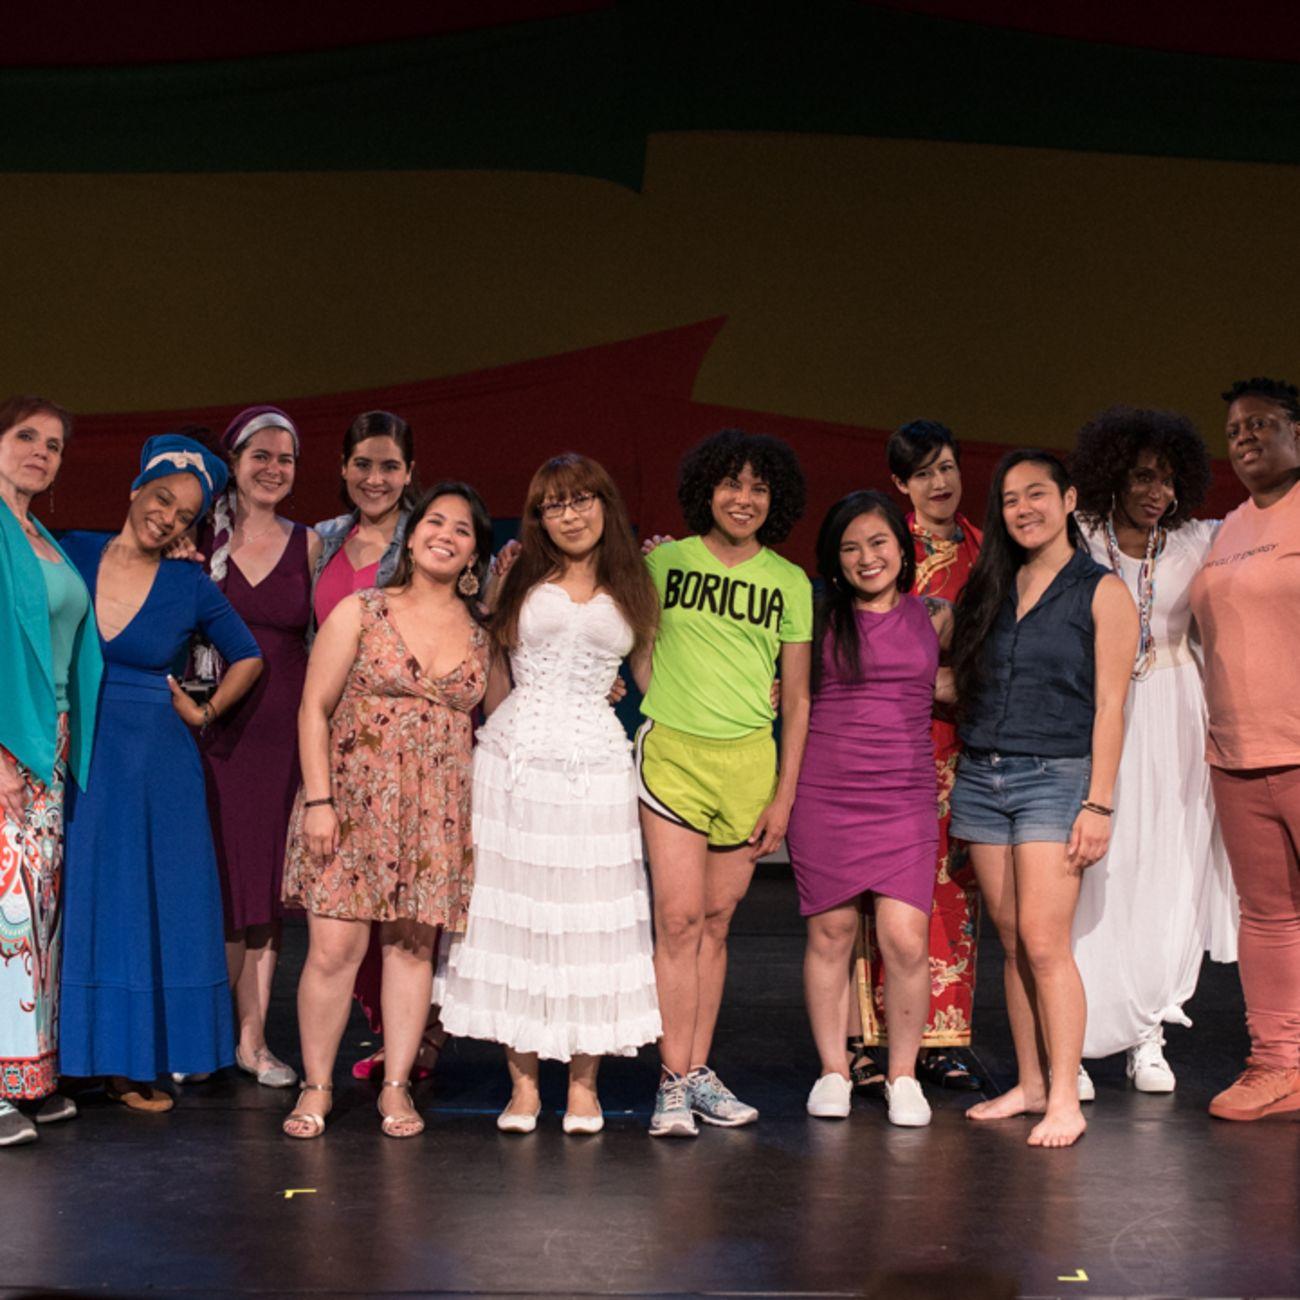 Celebrate Authentic Representation & Enjoy Artistic Performances by Women of Color